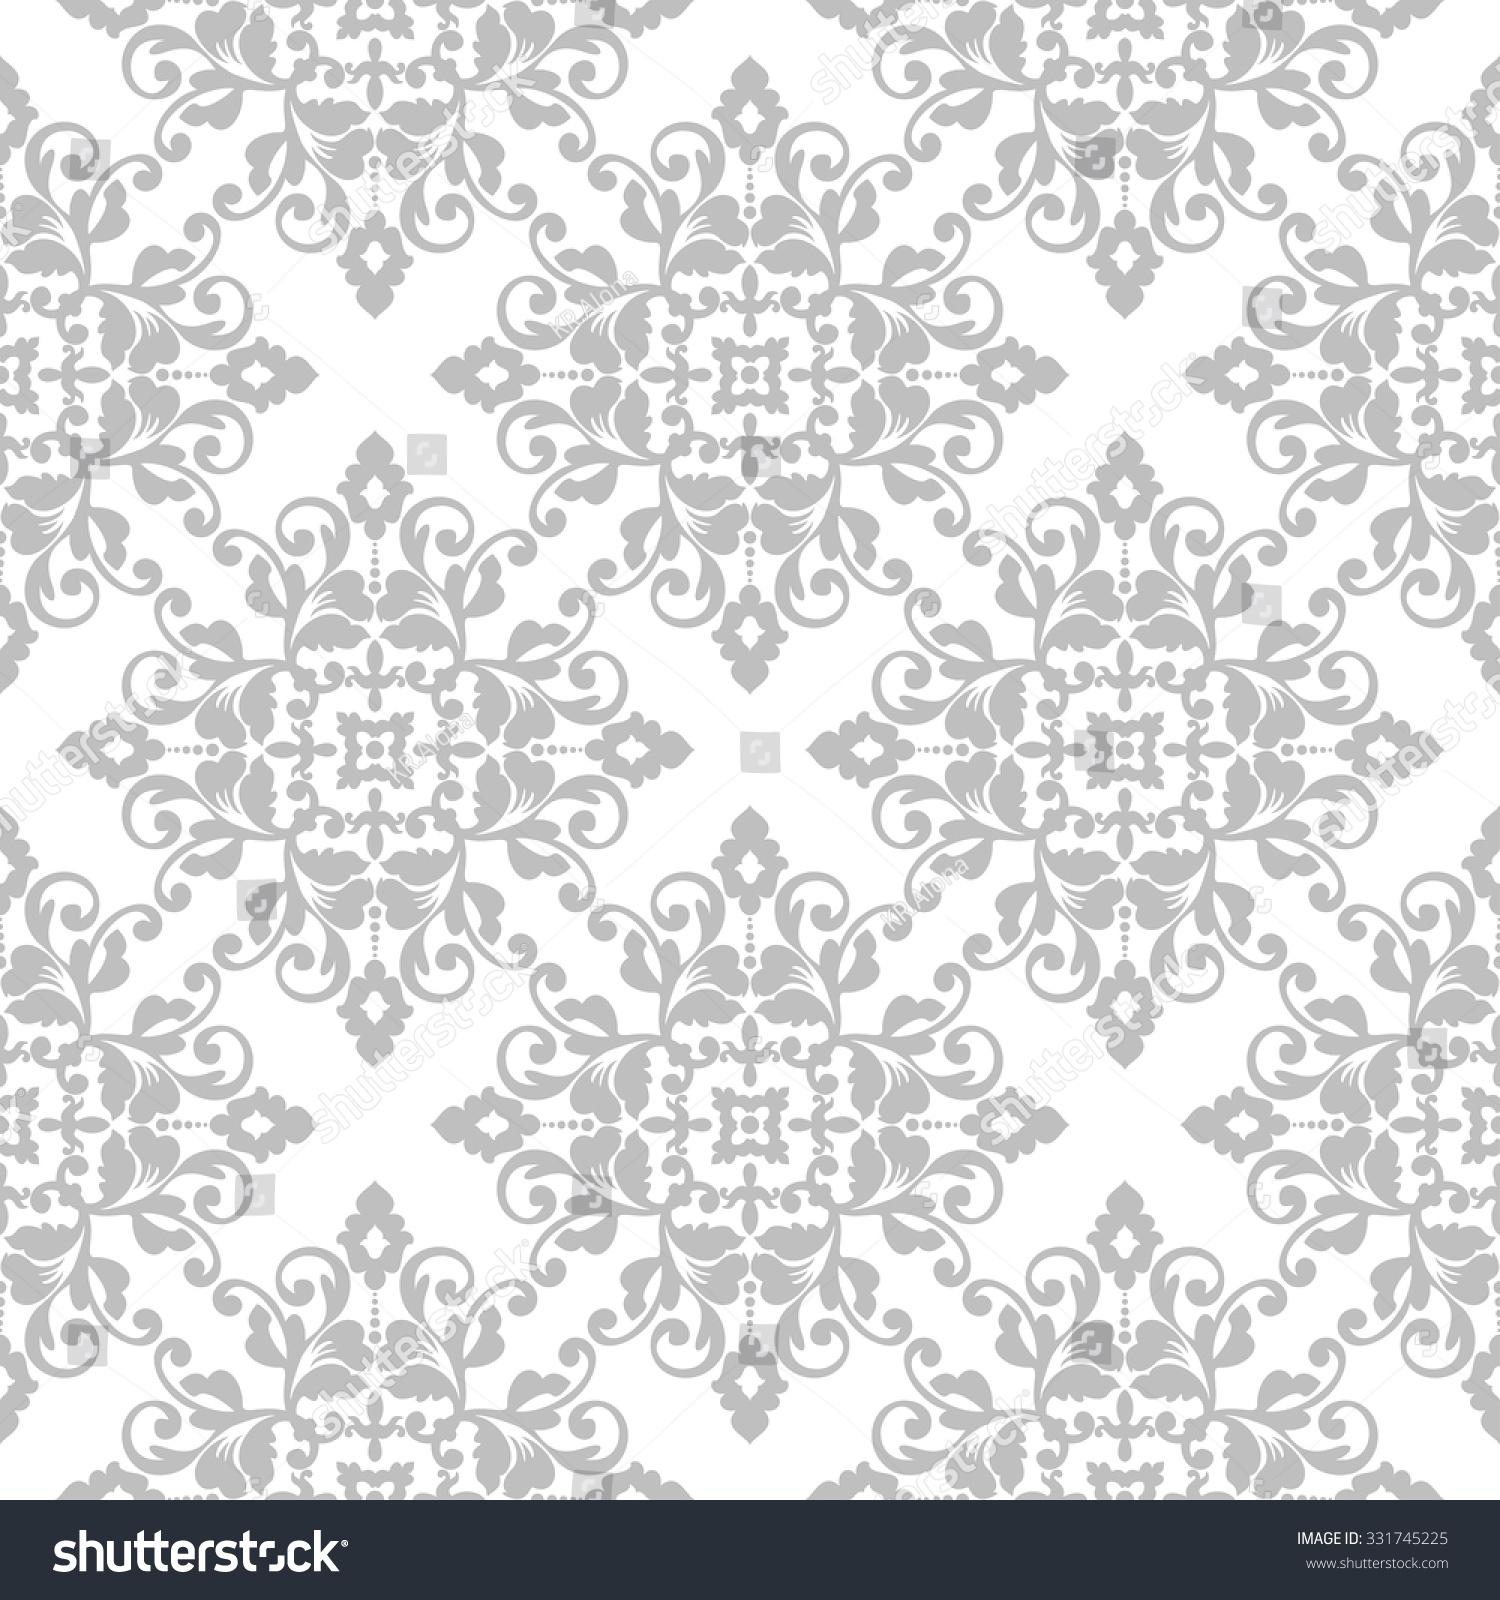 damask wallpaper glamorous and elegant - photo #12